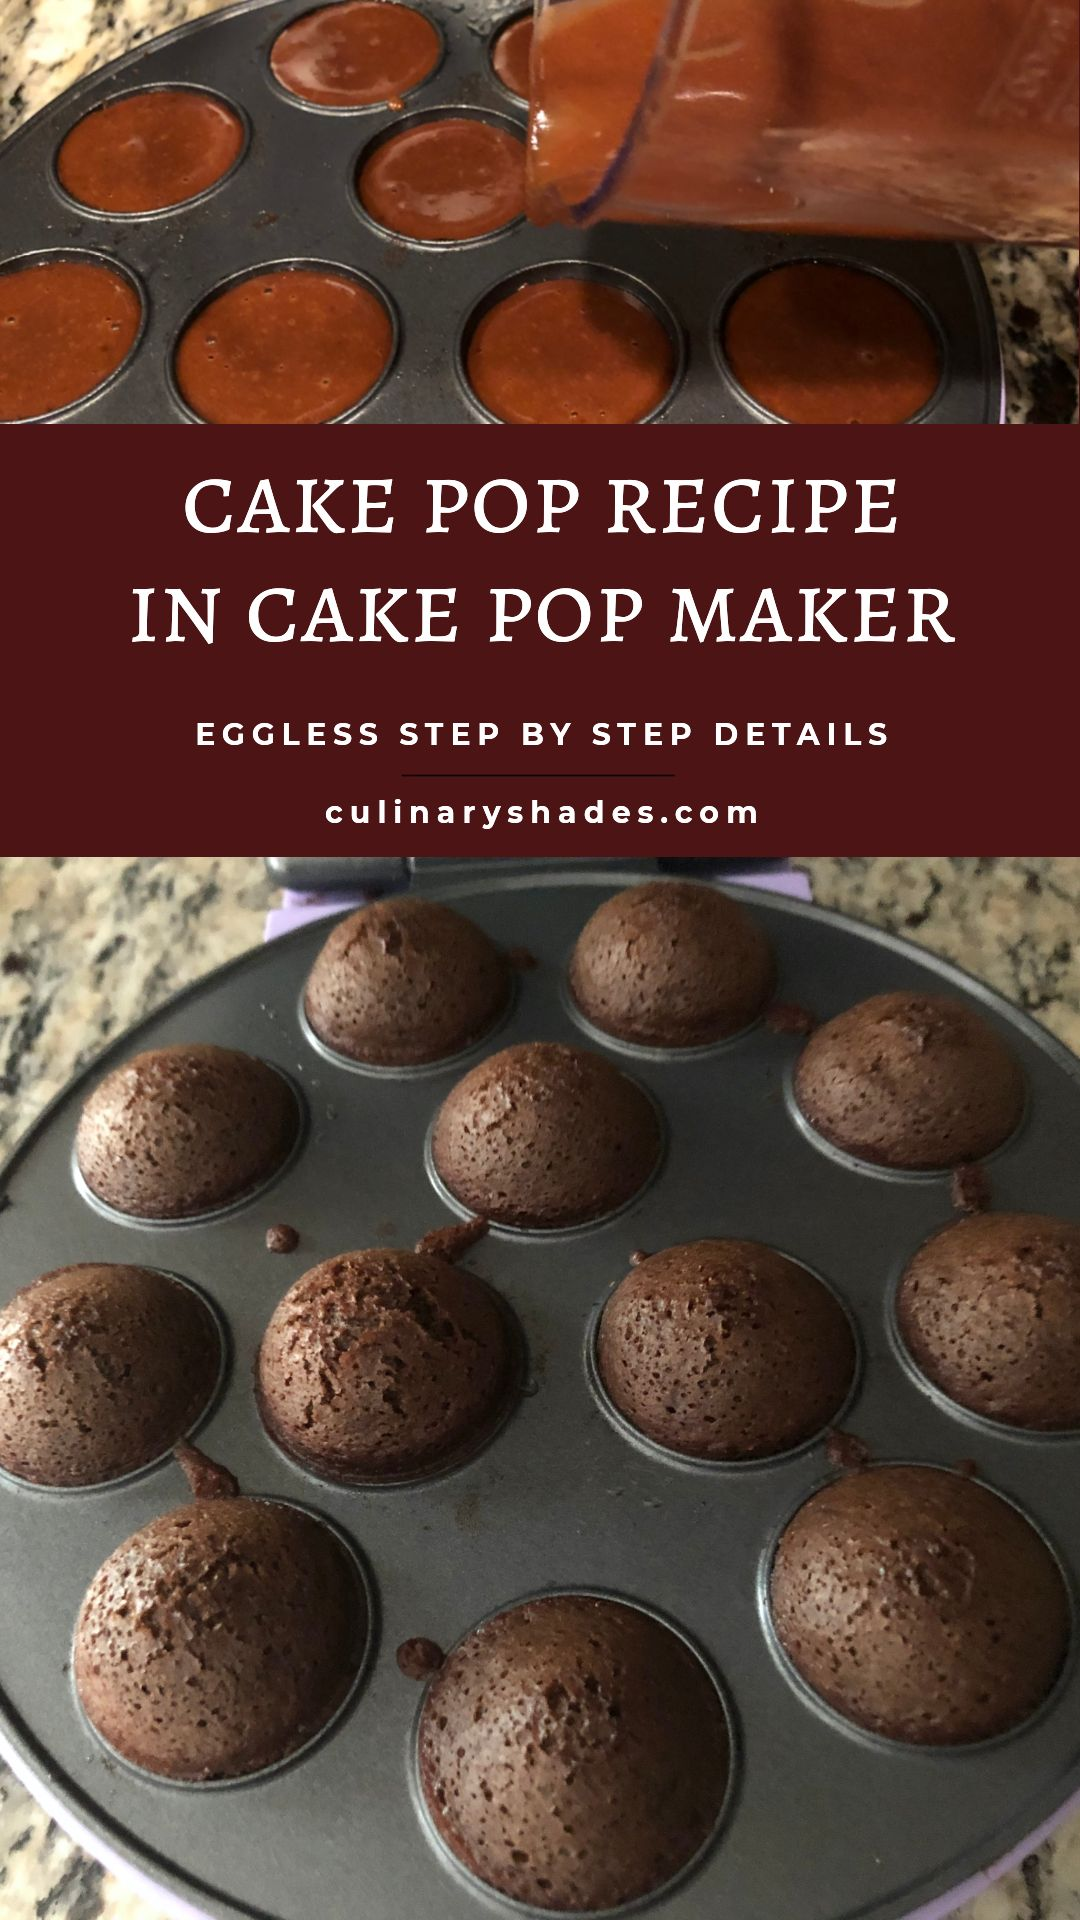 Cake Pops Recipe With Cake Pop Maker